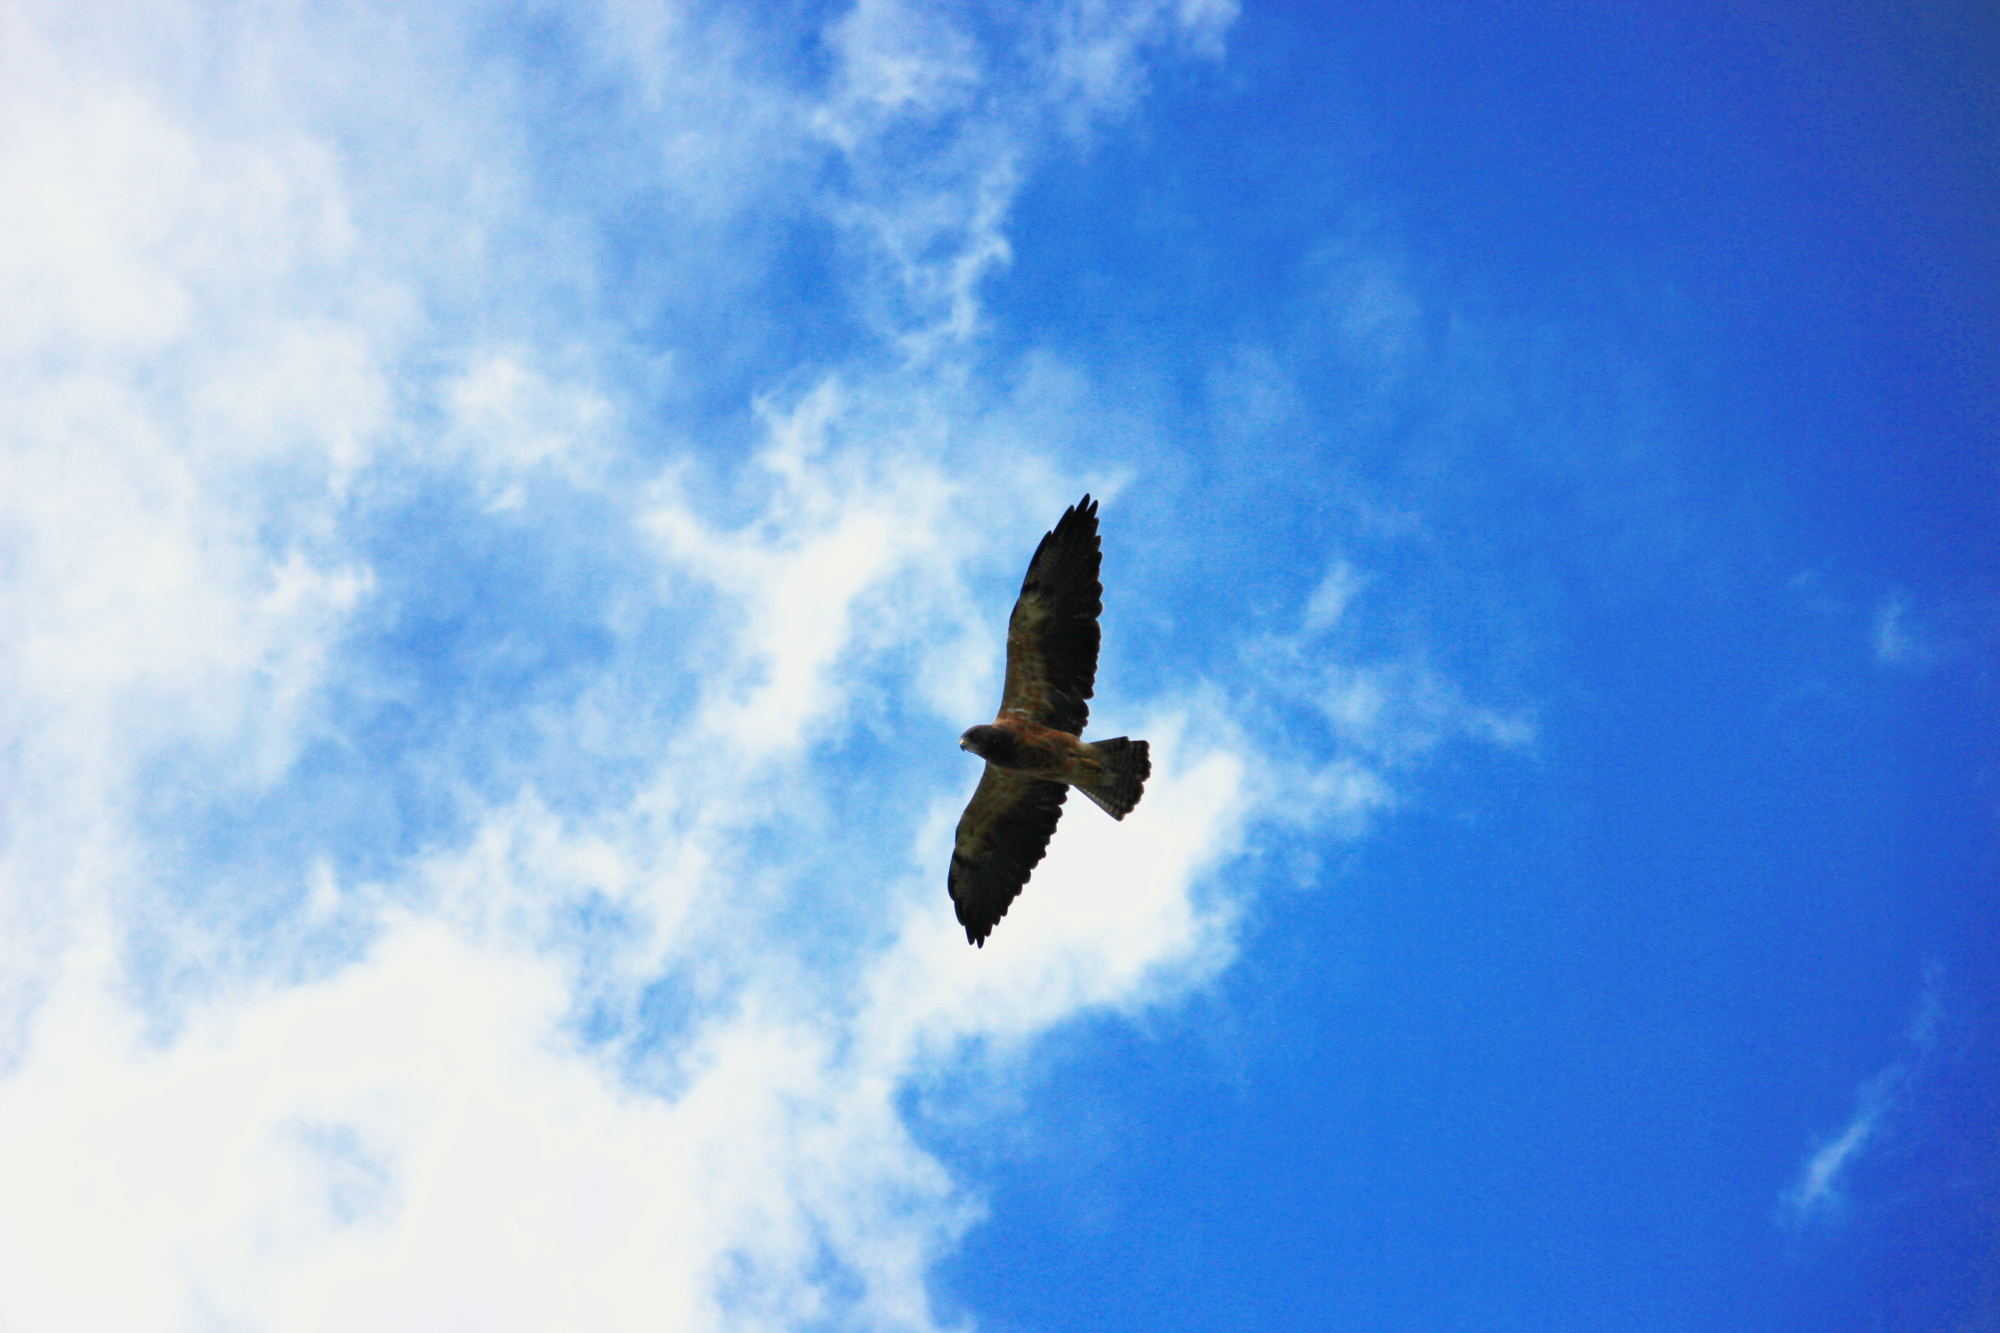 A hawk against the sky